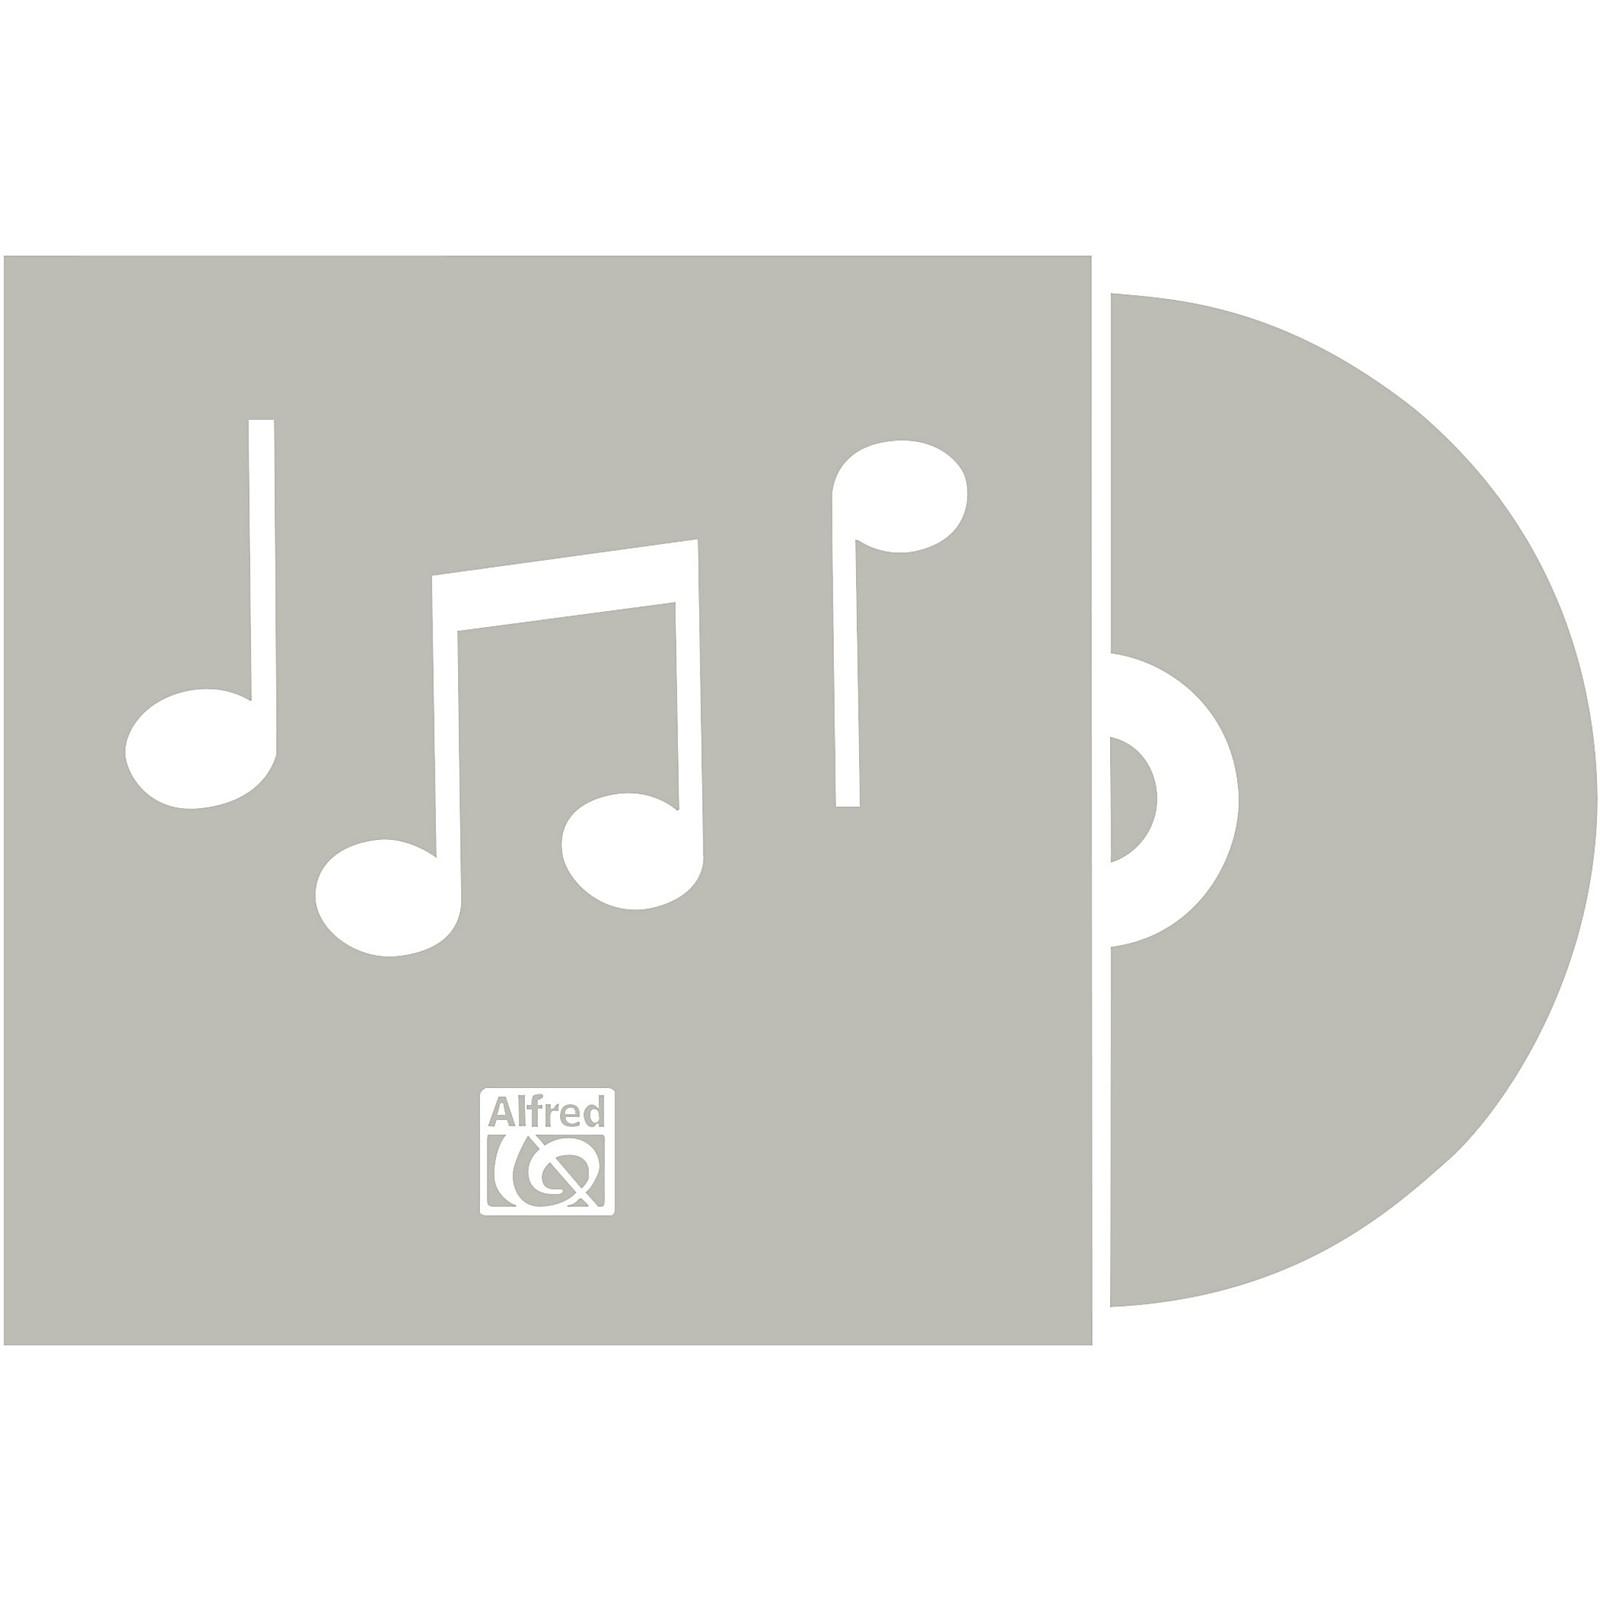 JUBILATE In The Final Week – Rehearsal Trax CD